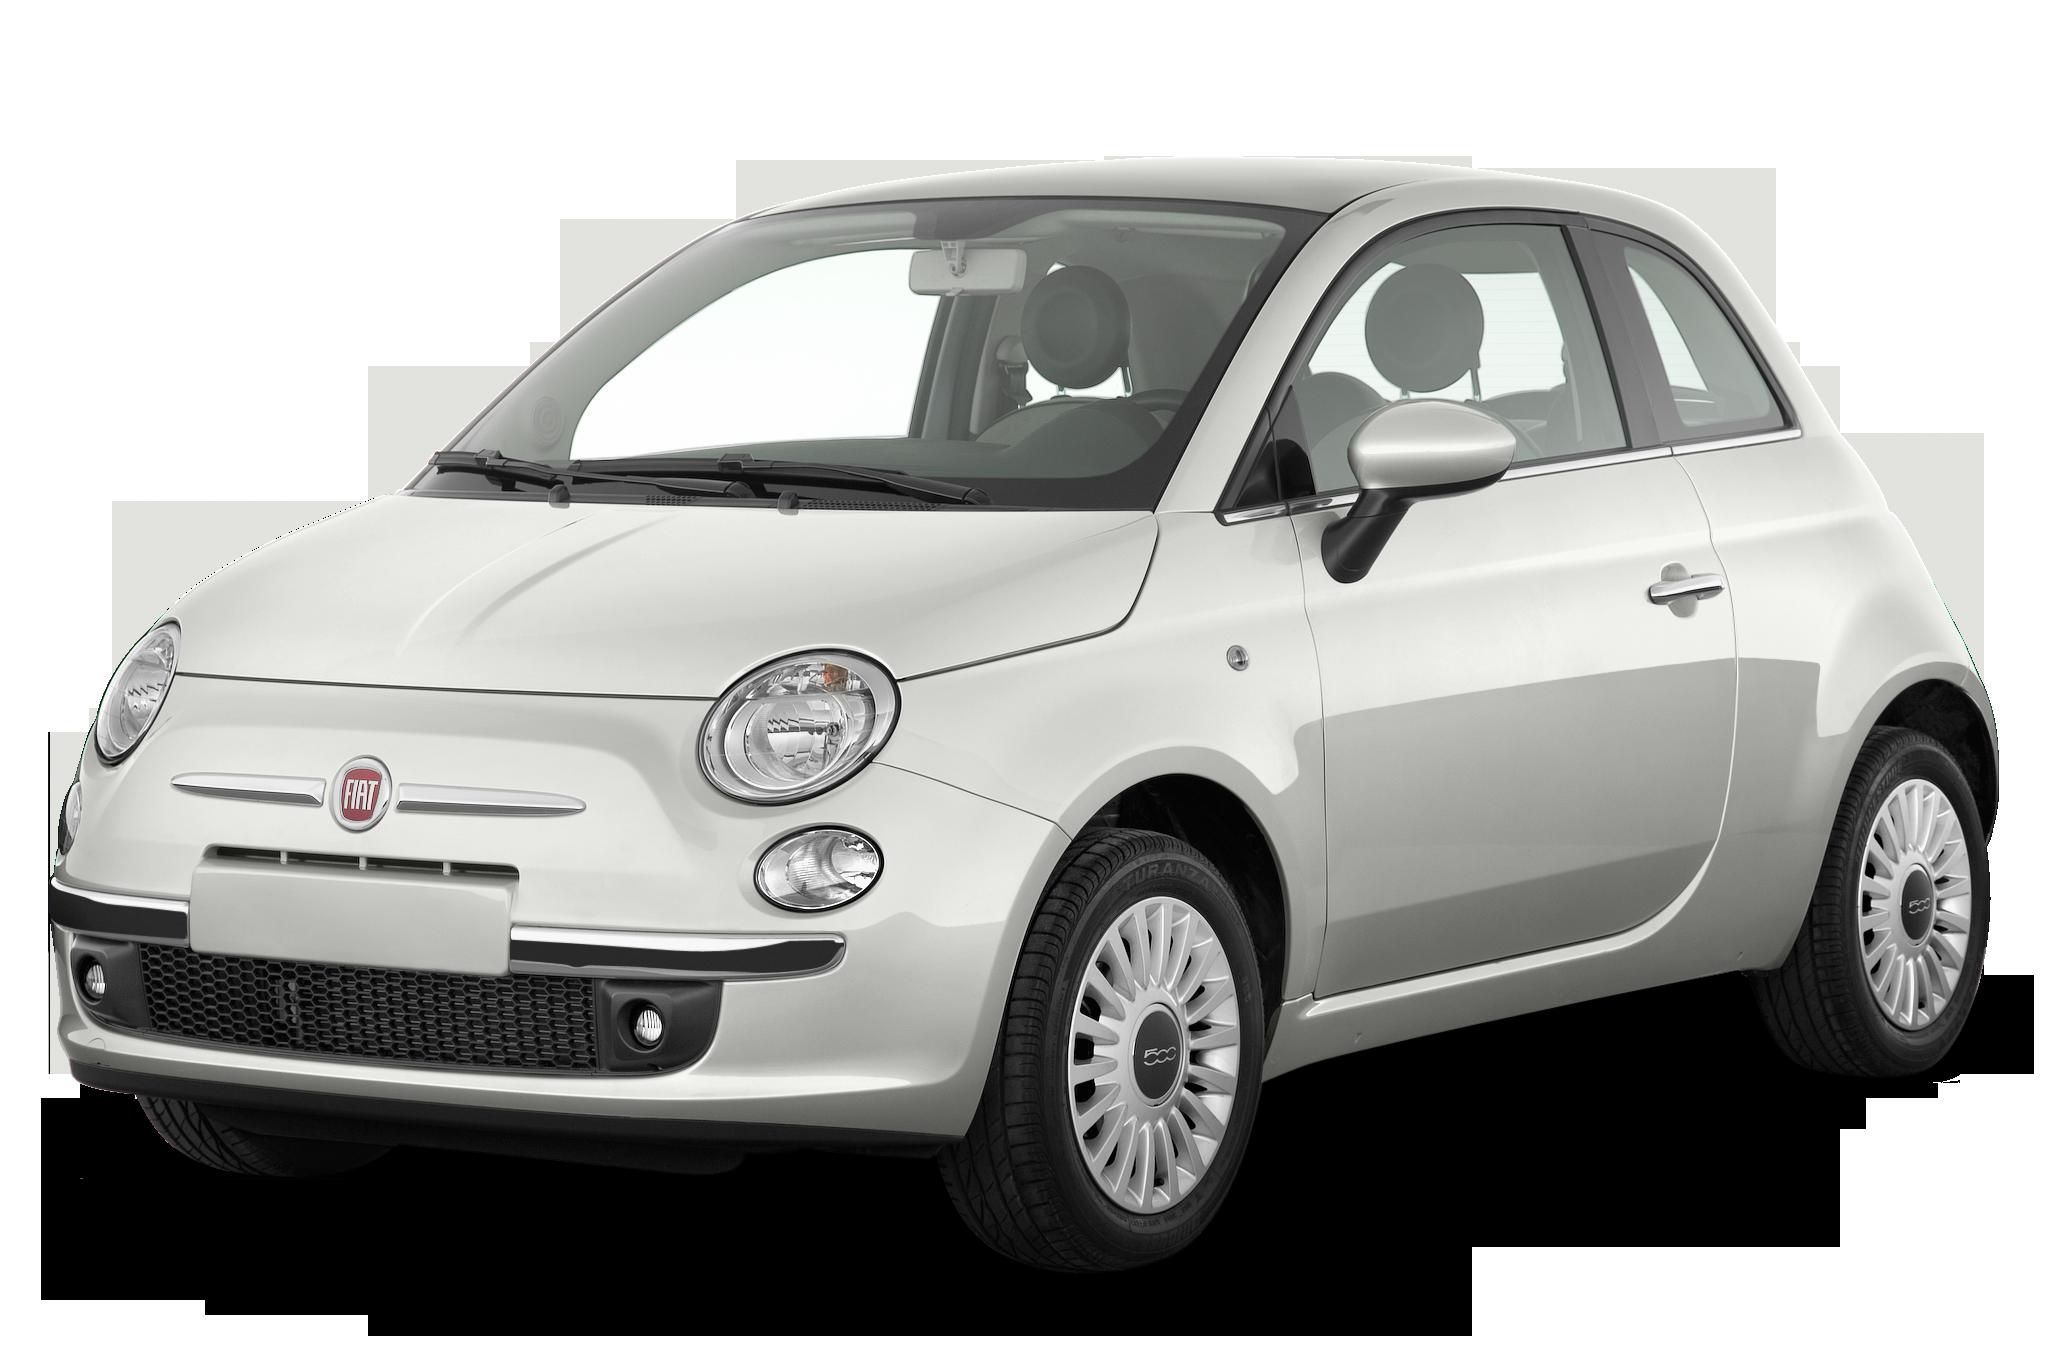 38 | 135 - Fiat HD PNG